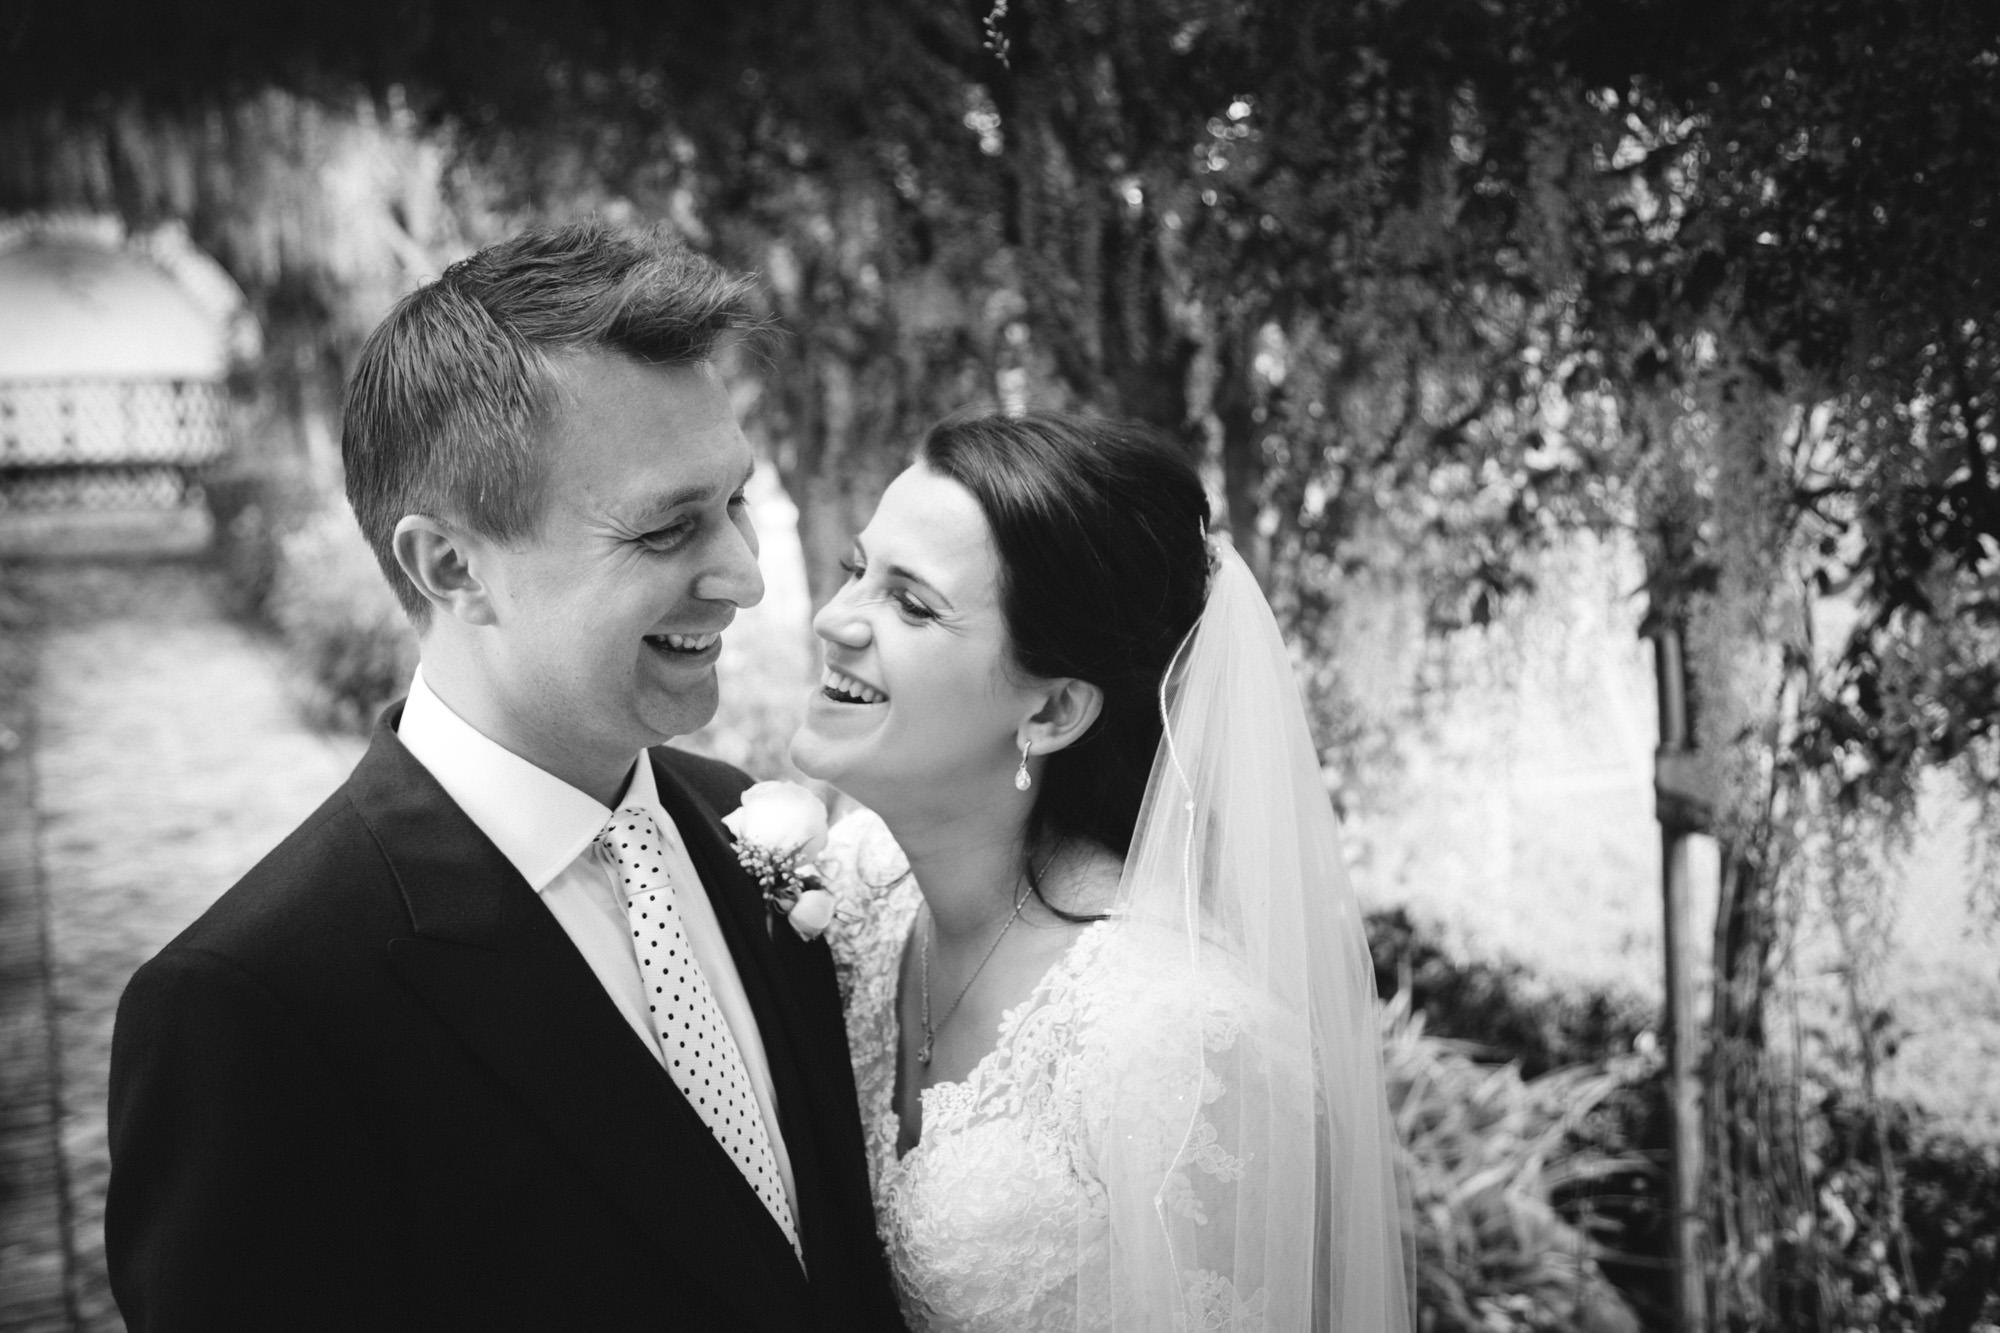 cambridge-wedding-photographer-io-1680-393.jpg